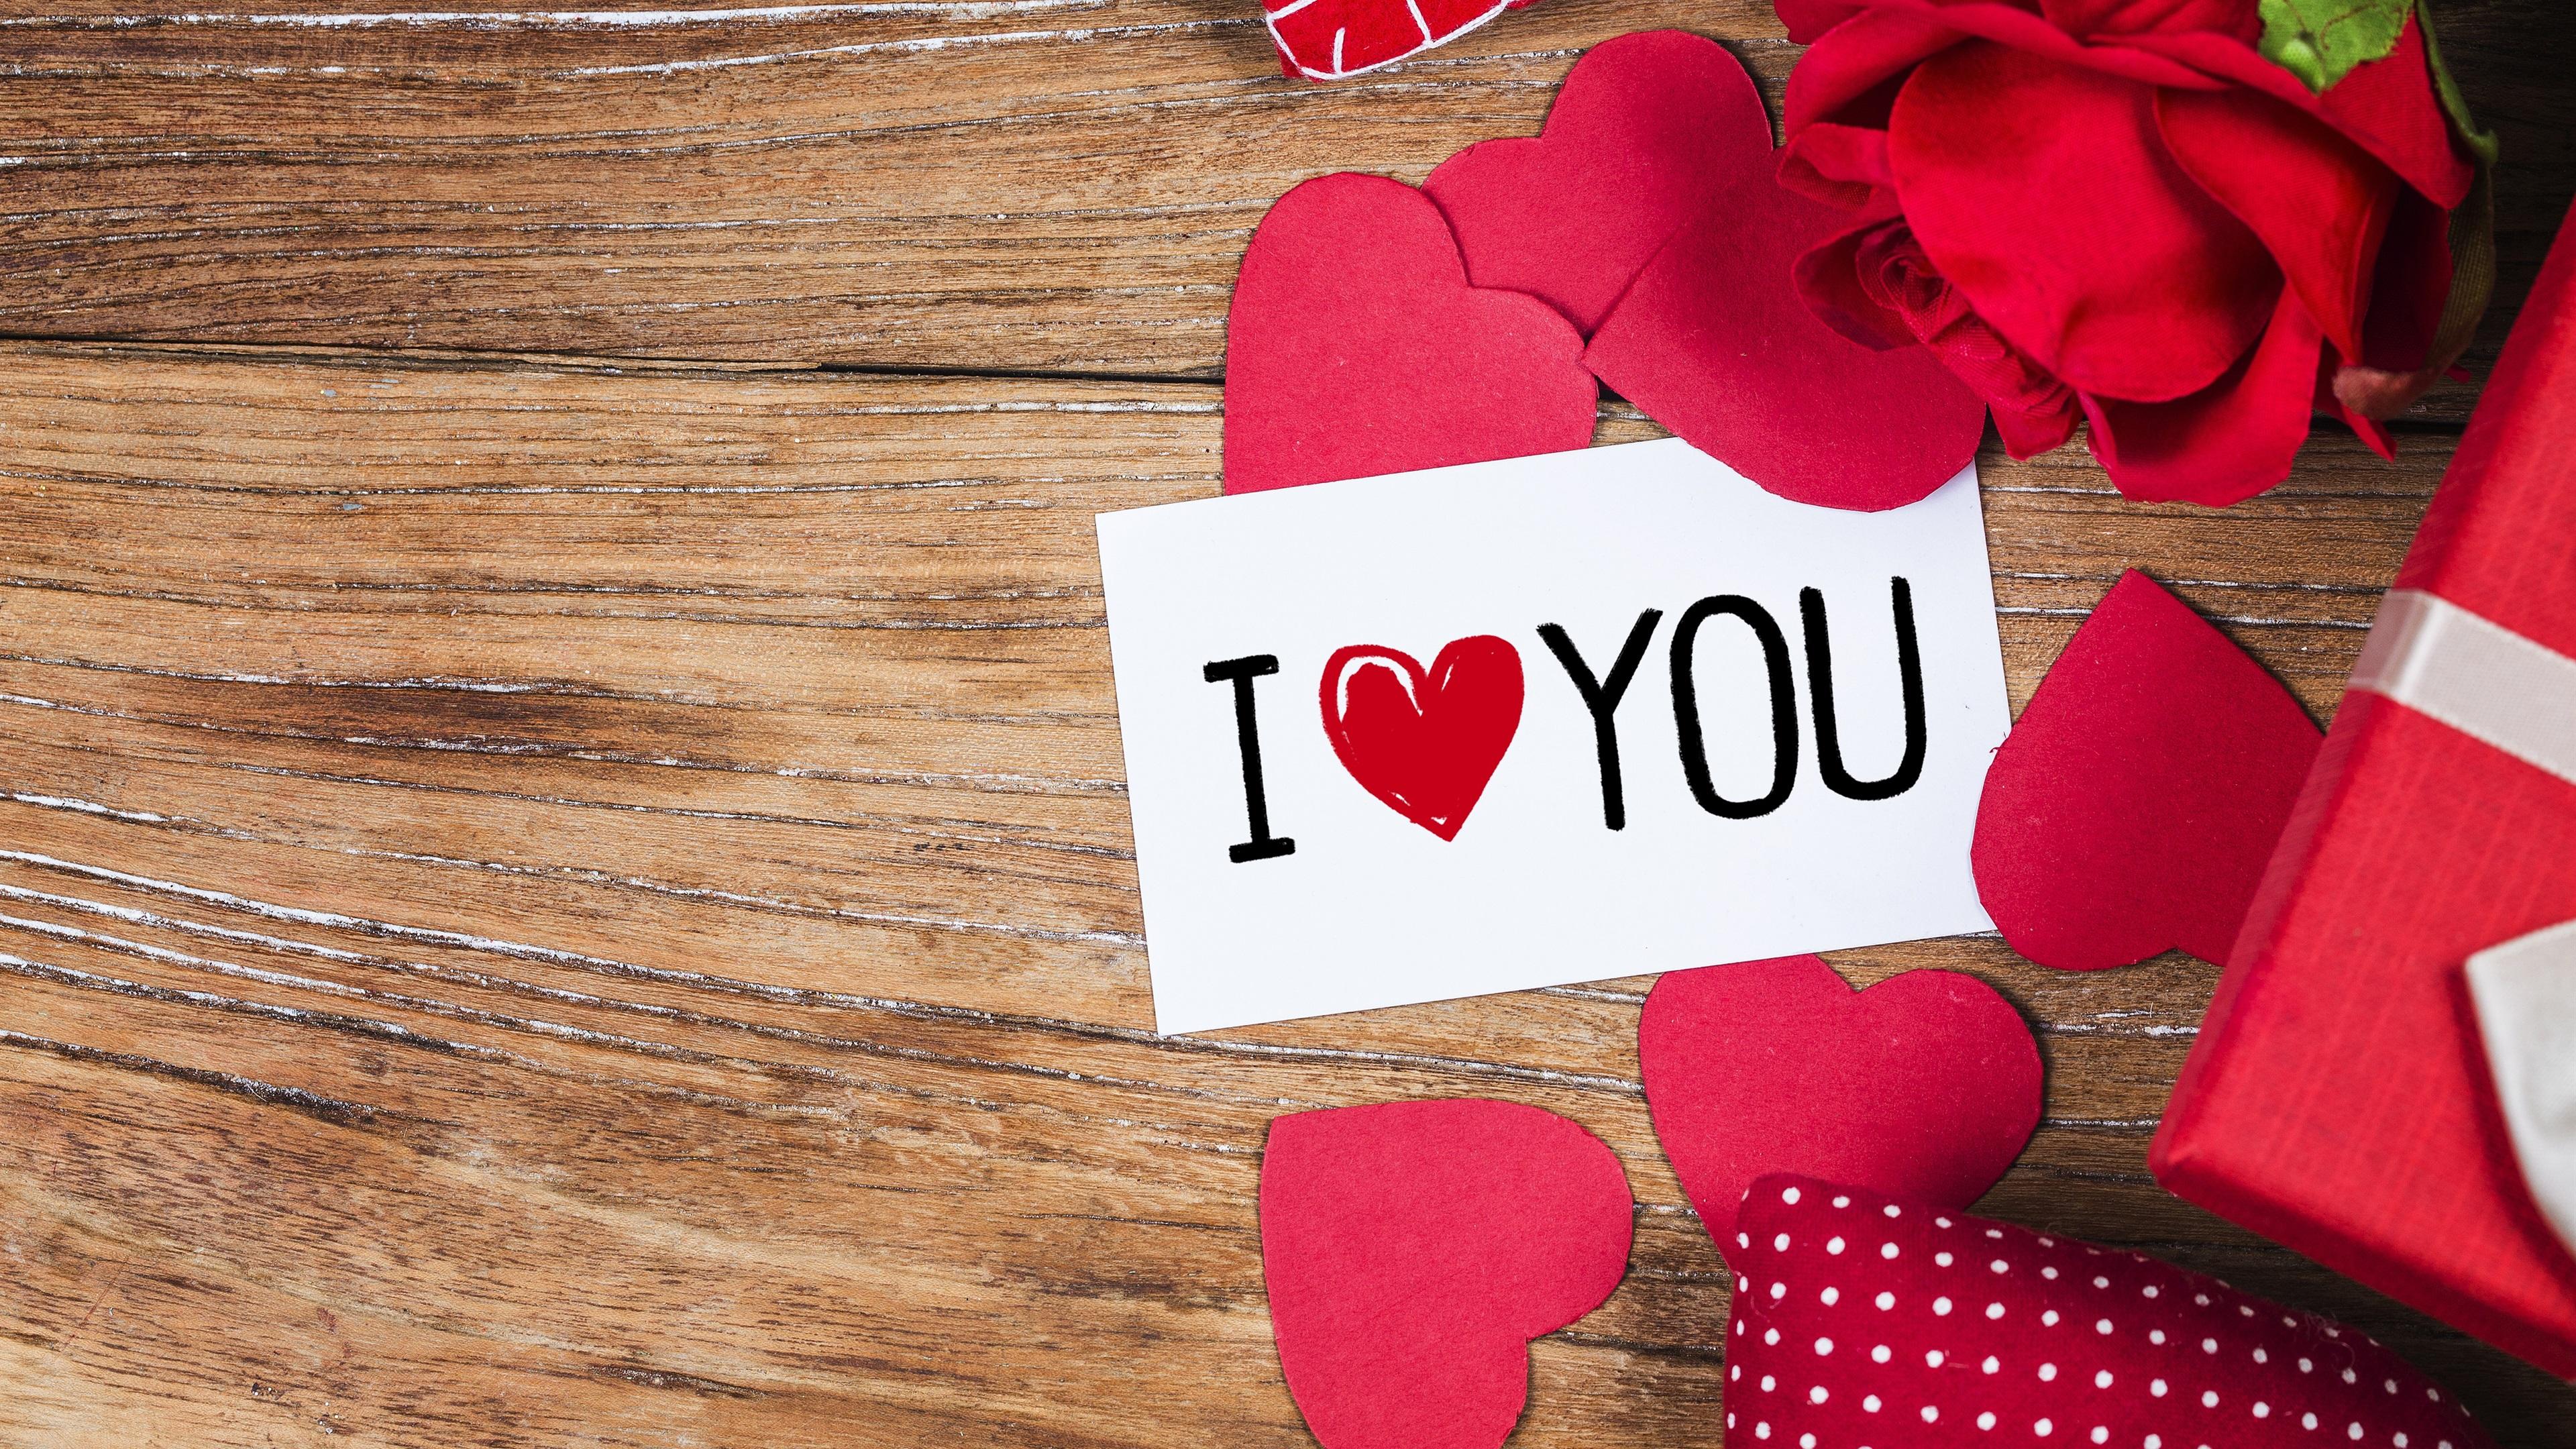 Fondos de pantalla te amo amo corazones regalo 3840x2160 - I love you 4k ...